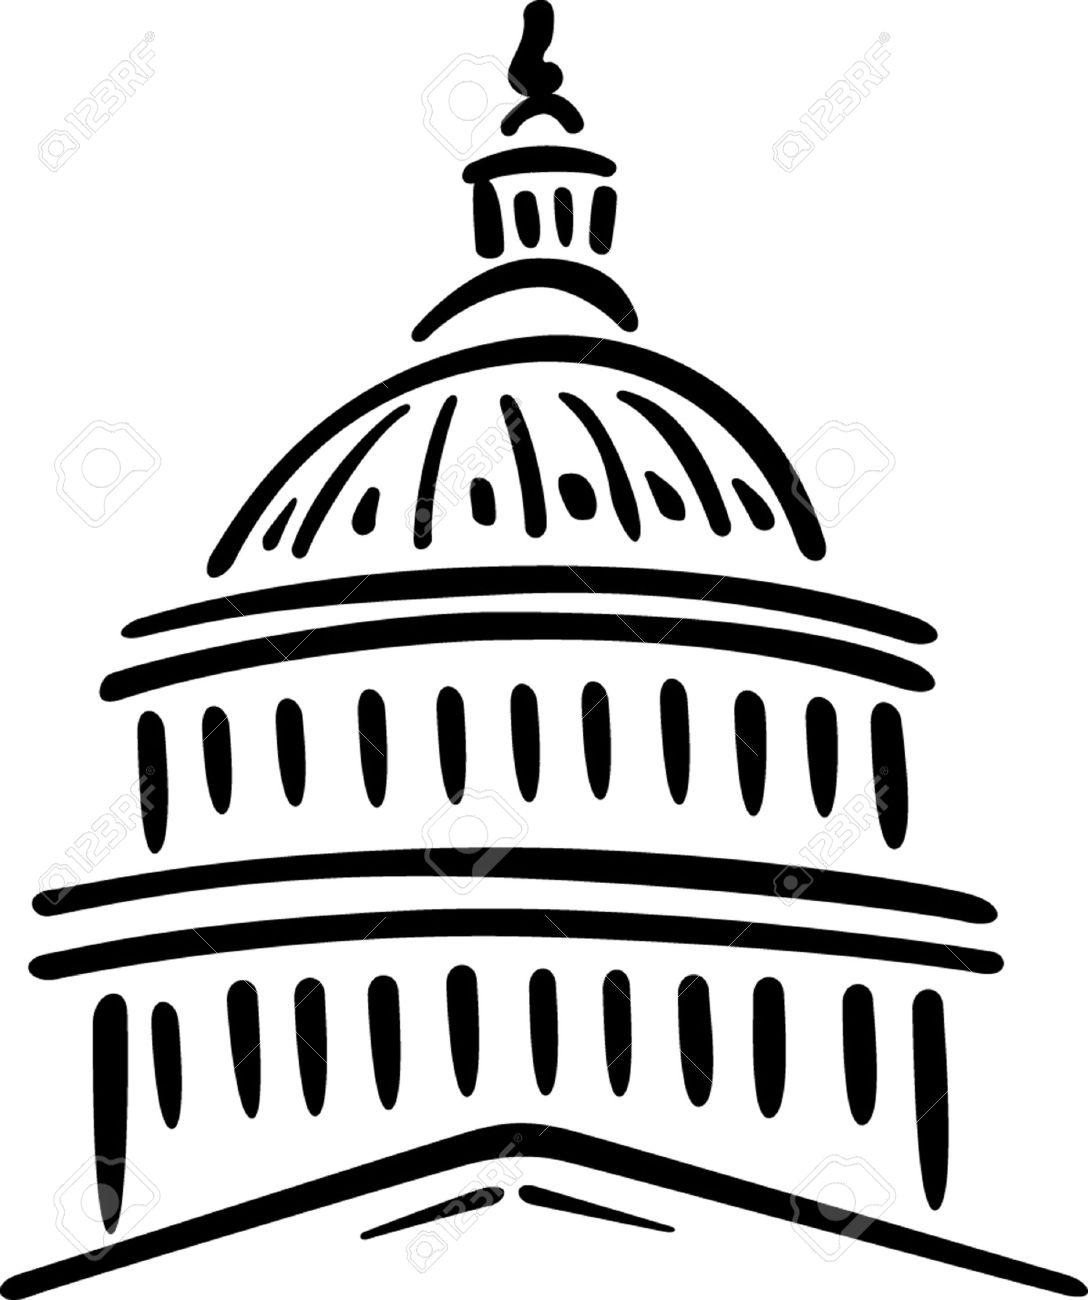 1088x1300 Illustration Of The U S Capitol, Washington D C Royalty Free